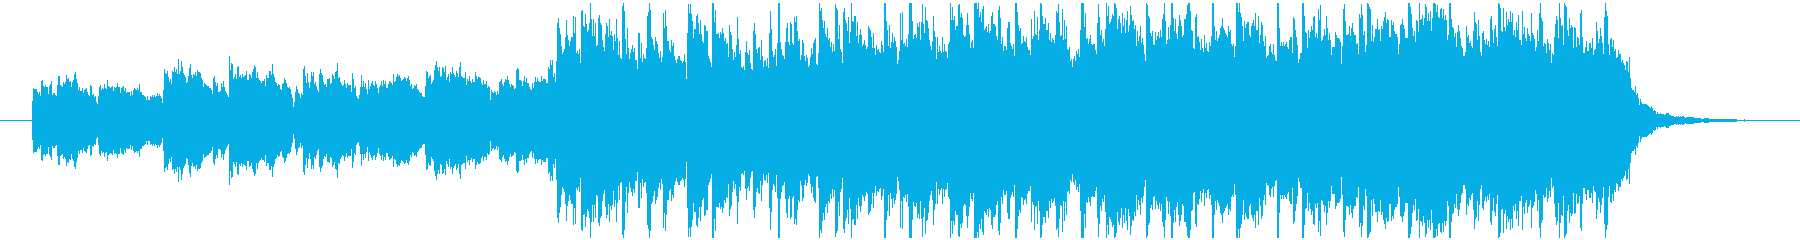 Waves Of Inspir. 60sの再生済みの波形